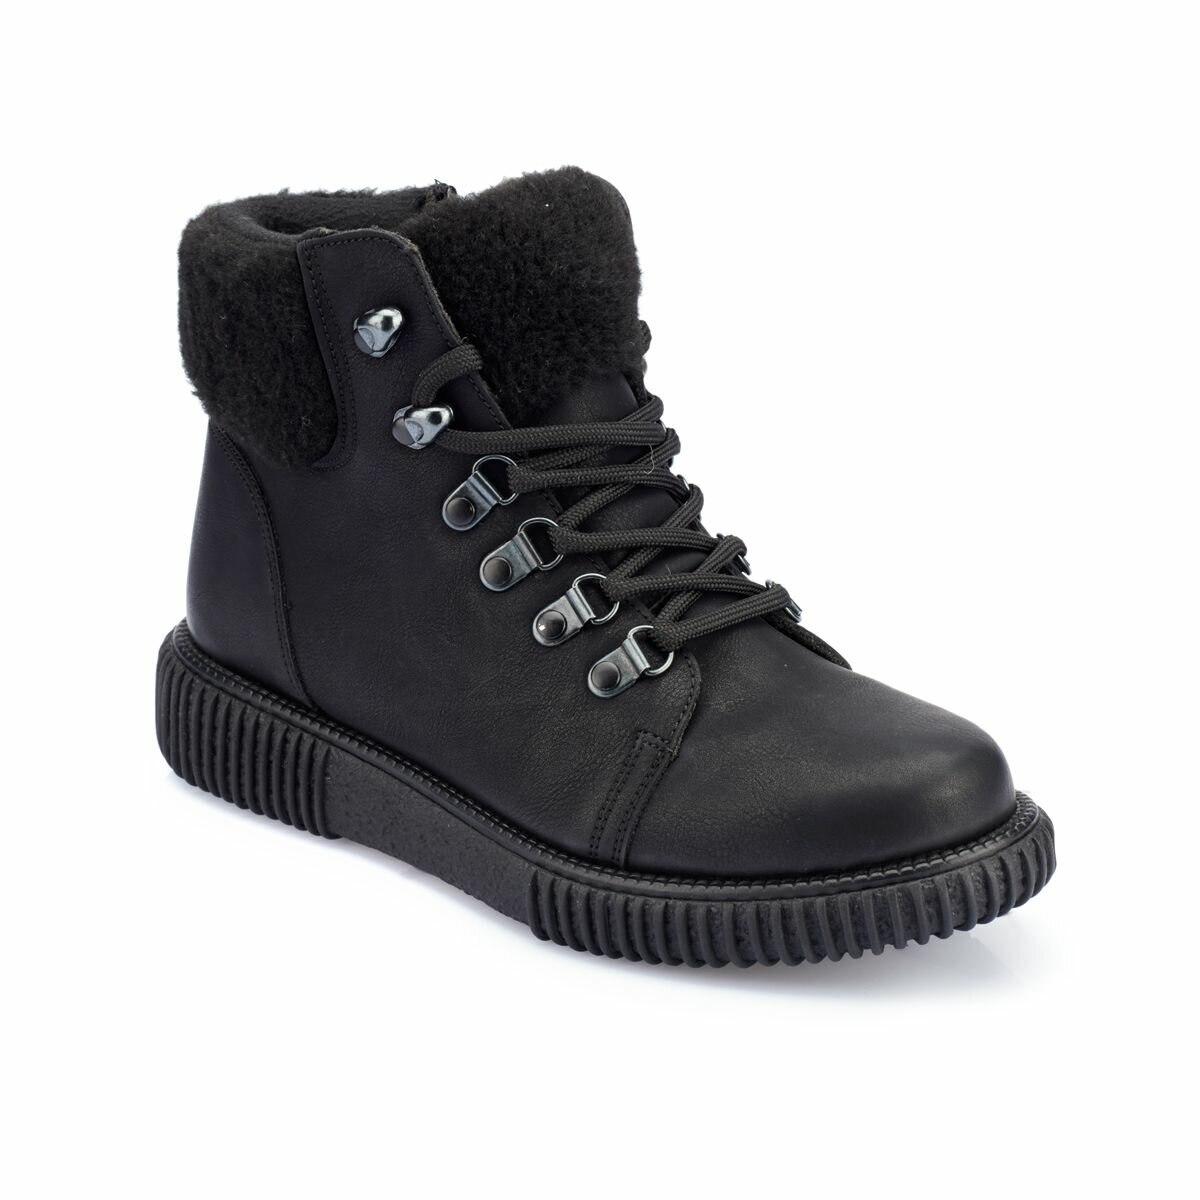 FLO 82.312386.Z Black Women Boots Polaris